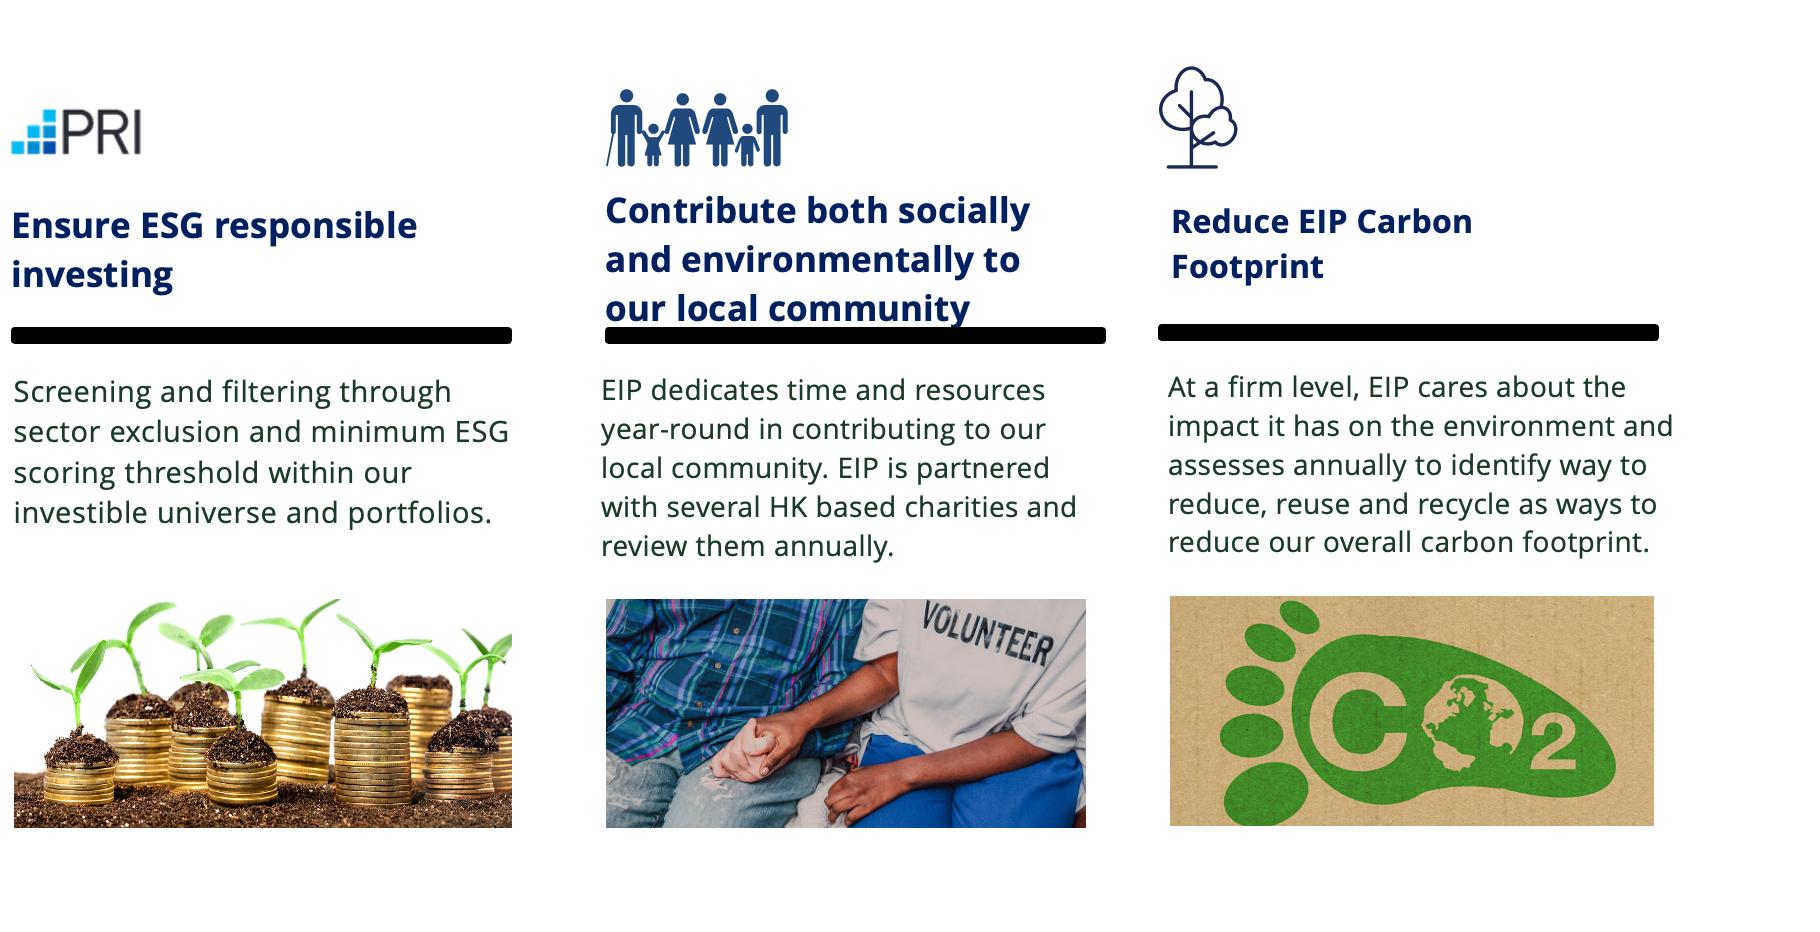 The Three Pillars of ESG at EIP